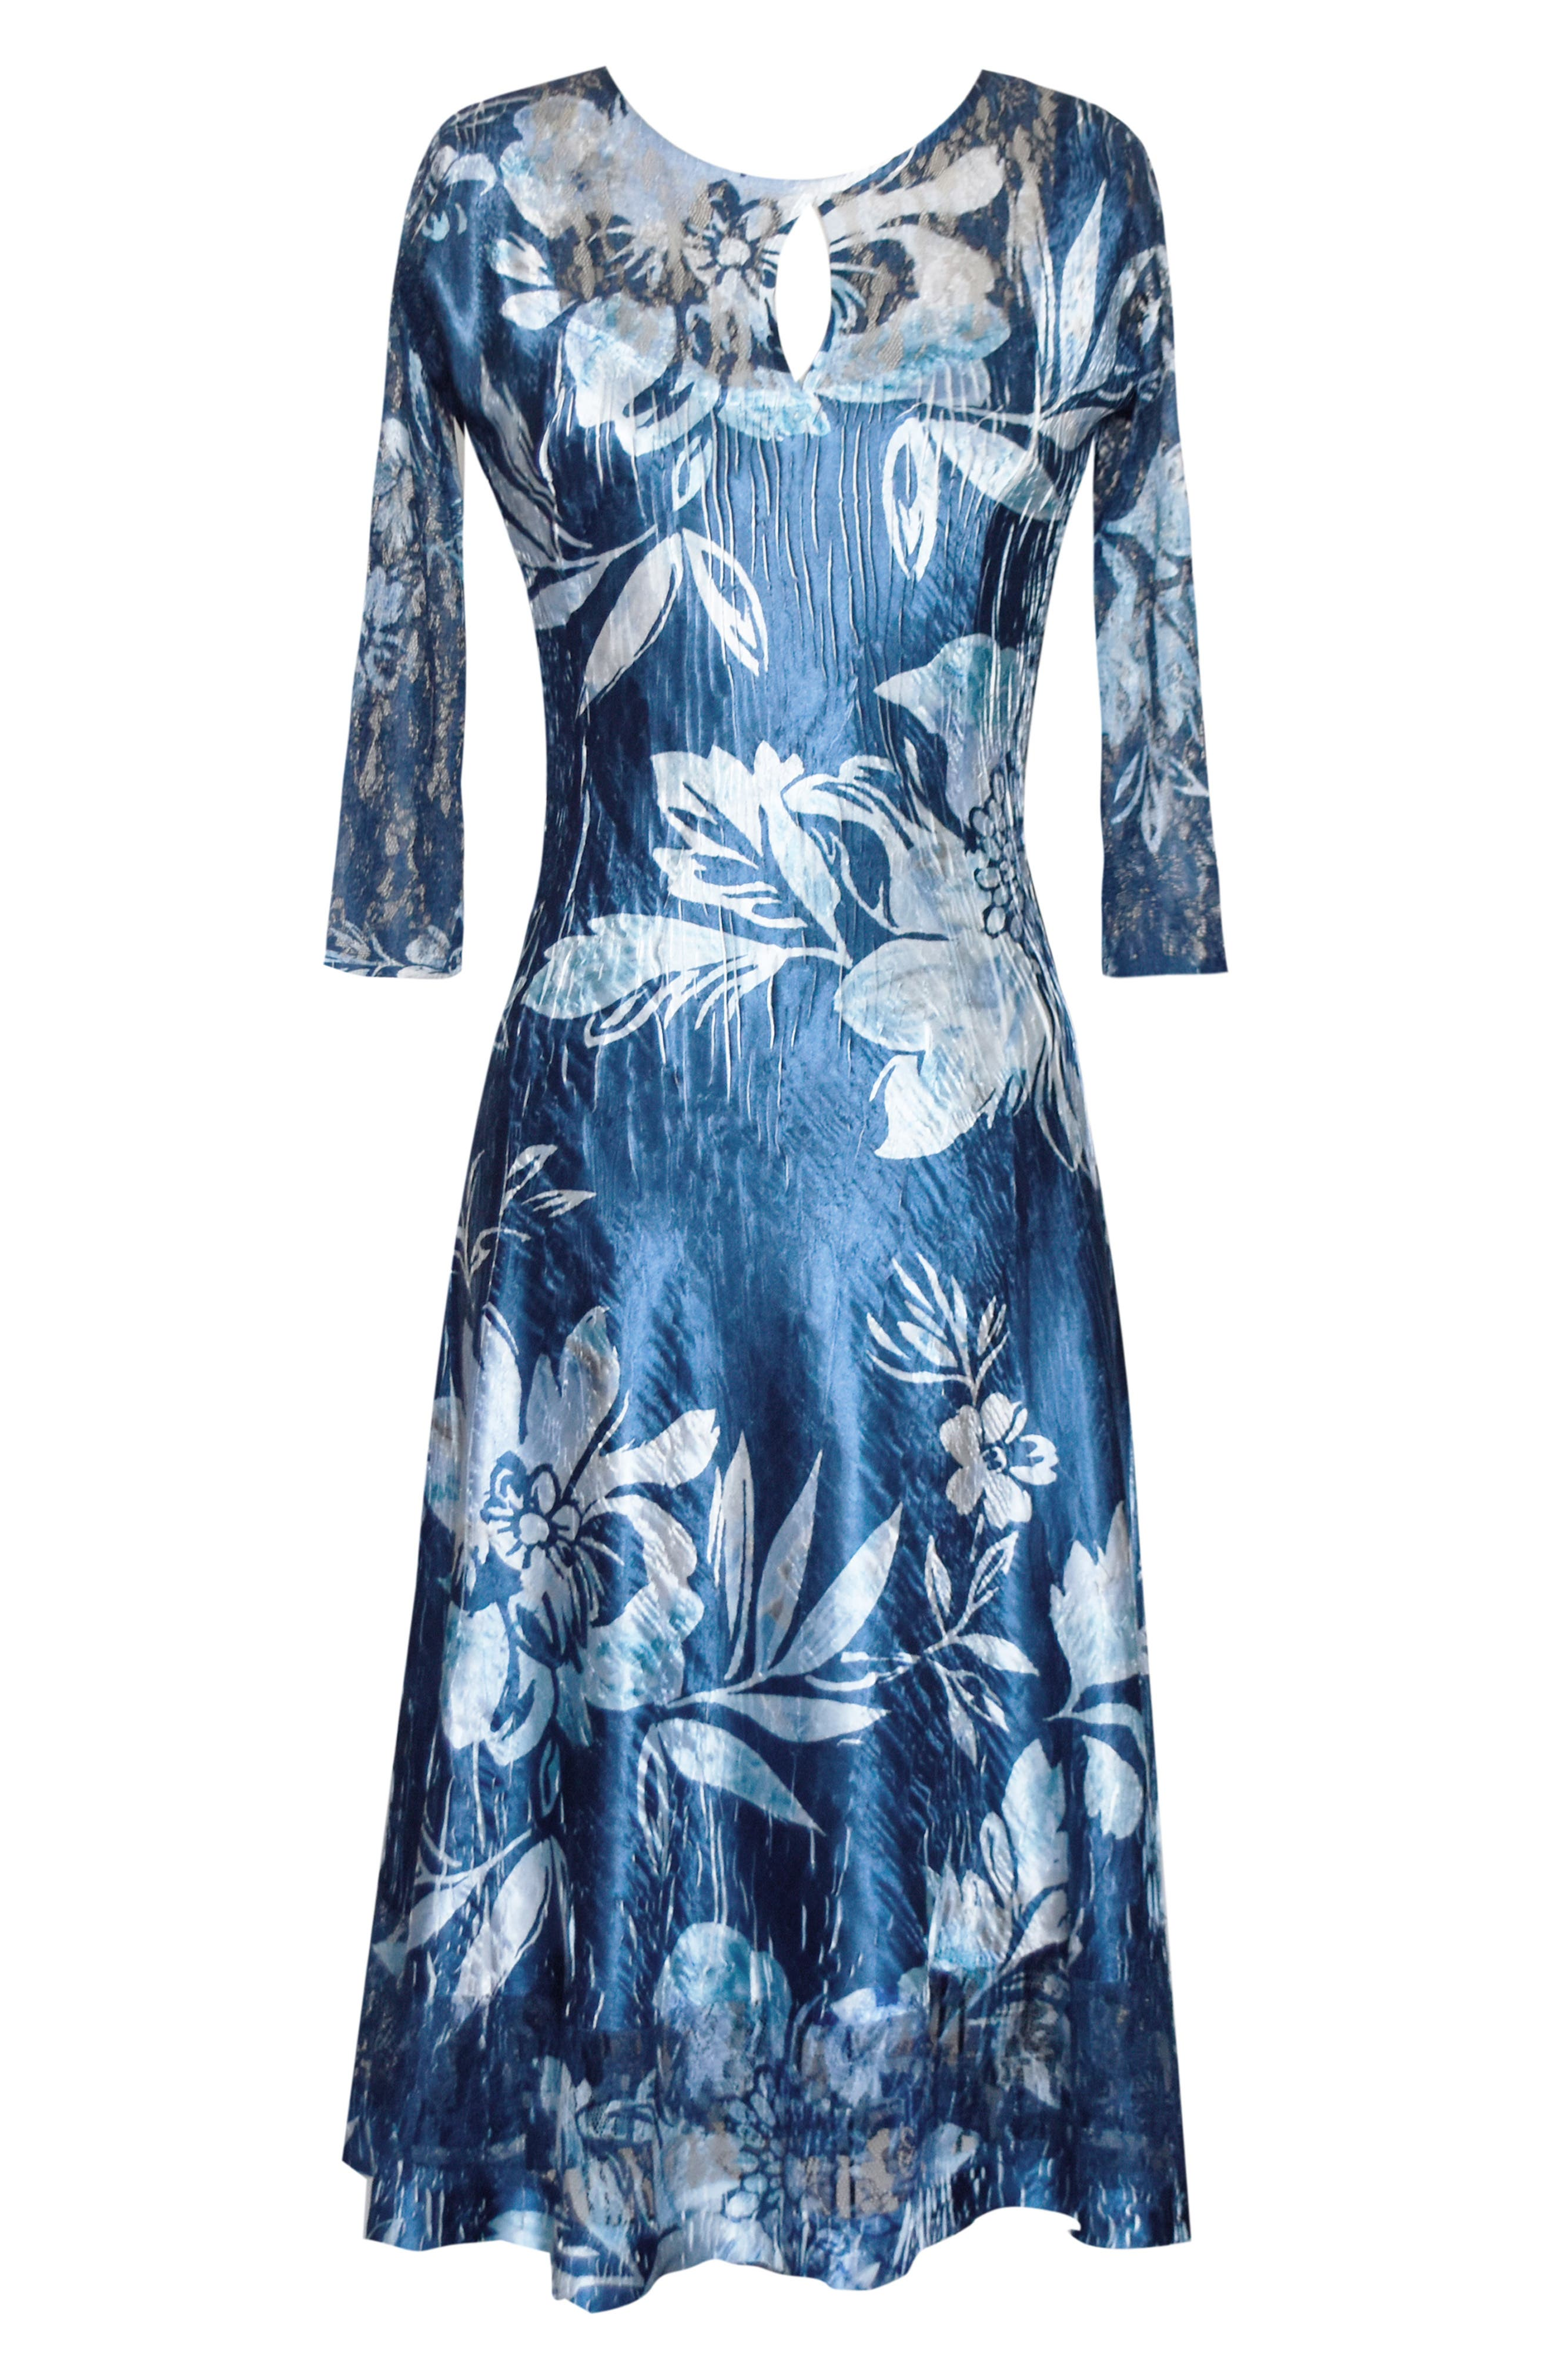 KOMAROV, Keyhole Cutout Floral Print Cocktail Dress, Alternate thumbnail 5, color, 400